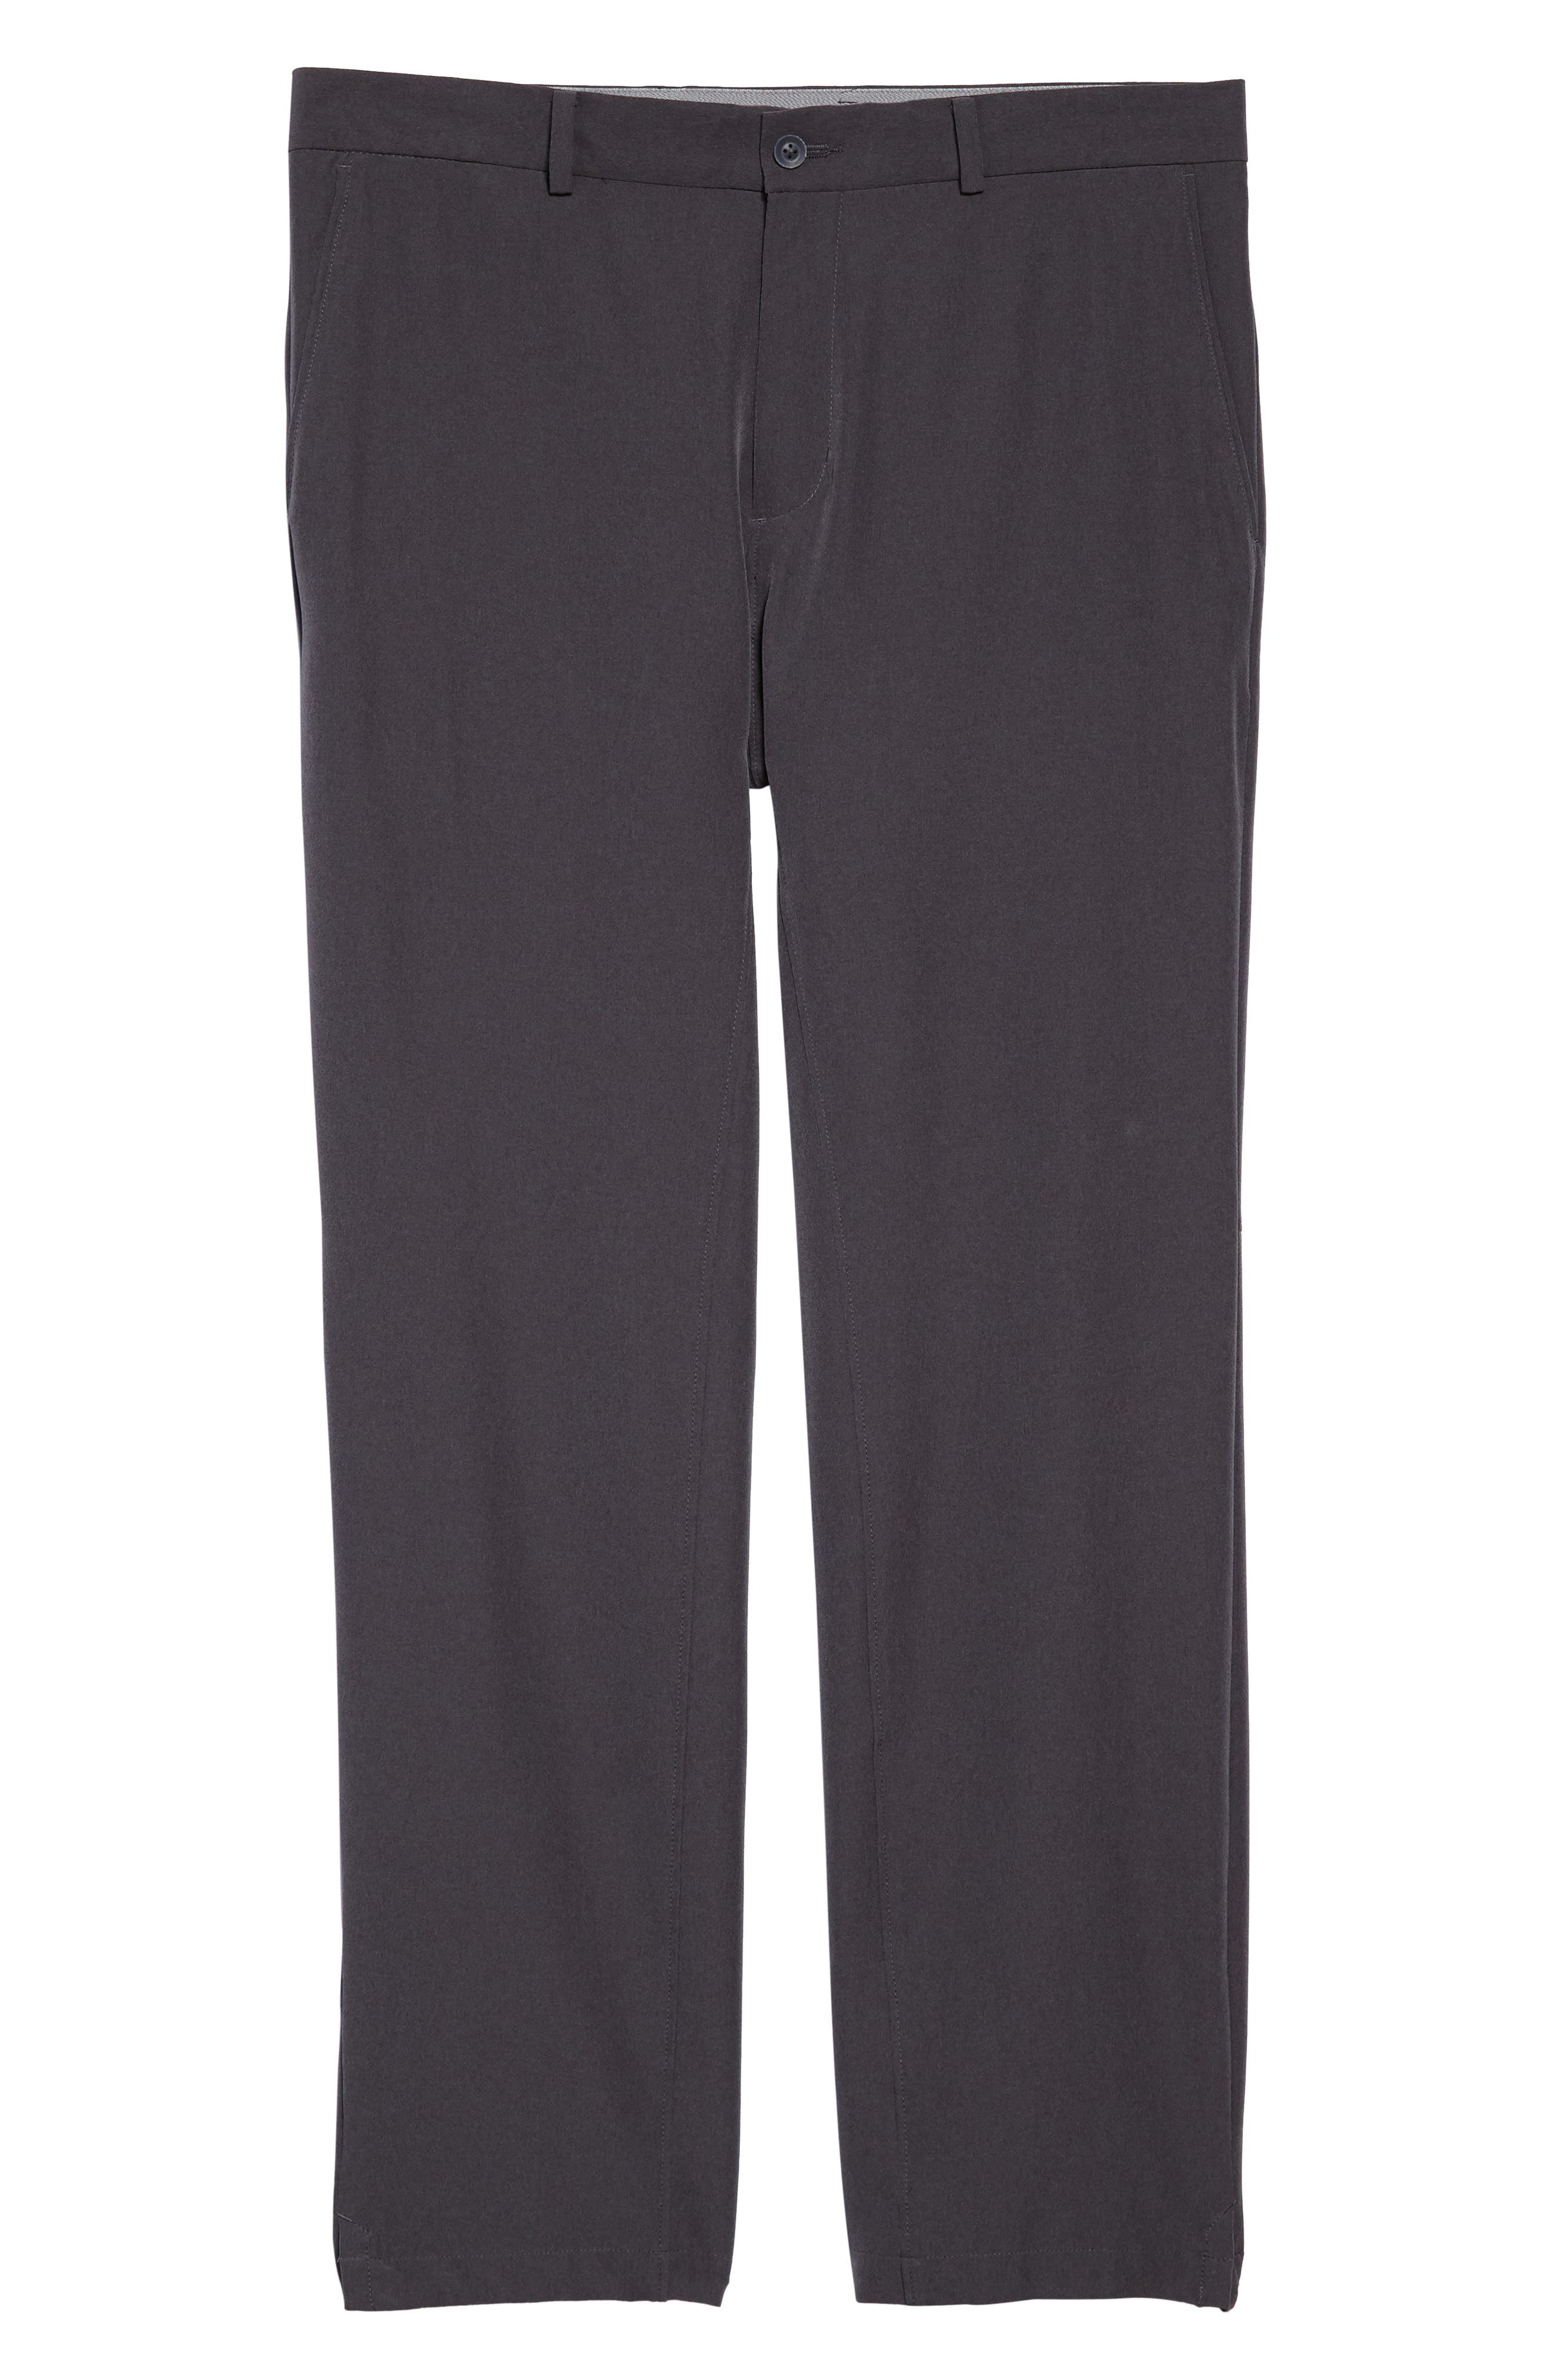 Hybrid Flex Golf Pants,                             Alternate thumbnail 6, color,                             CHARCOAL HEATHER/ DARK GREY